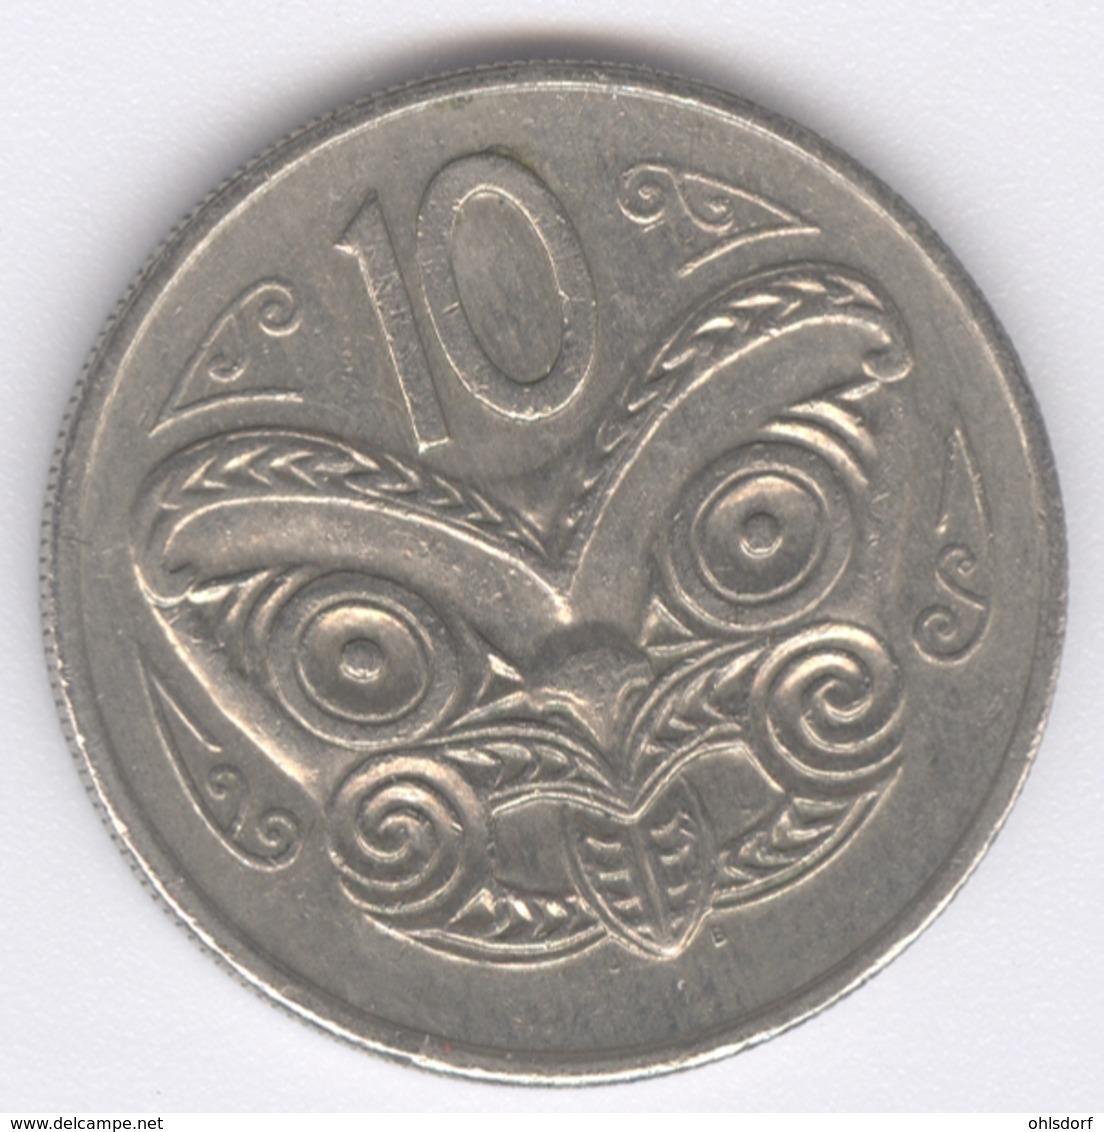 NEW ZEALAND 1982: 10 Cents, KM 41 - New Zealand